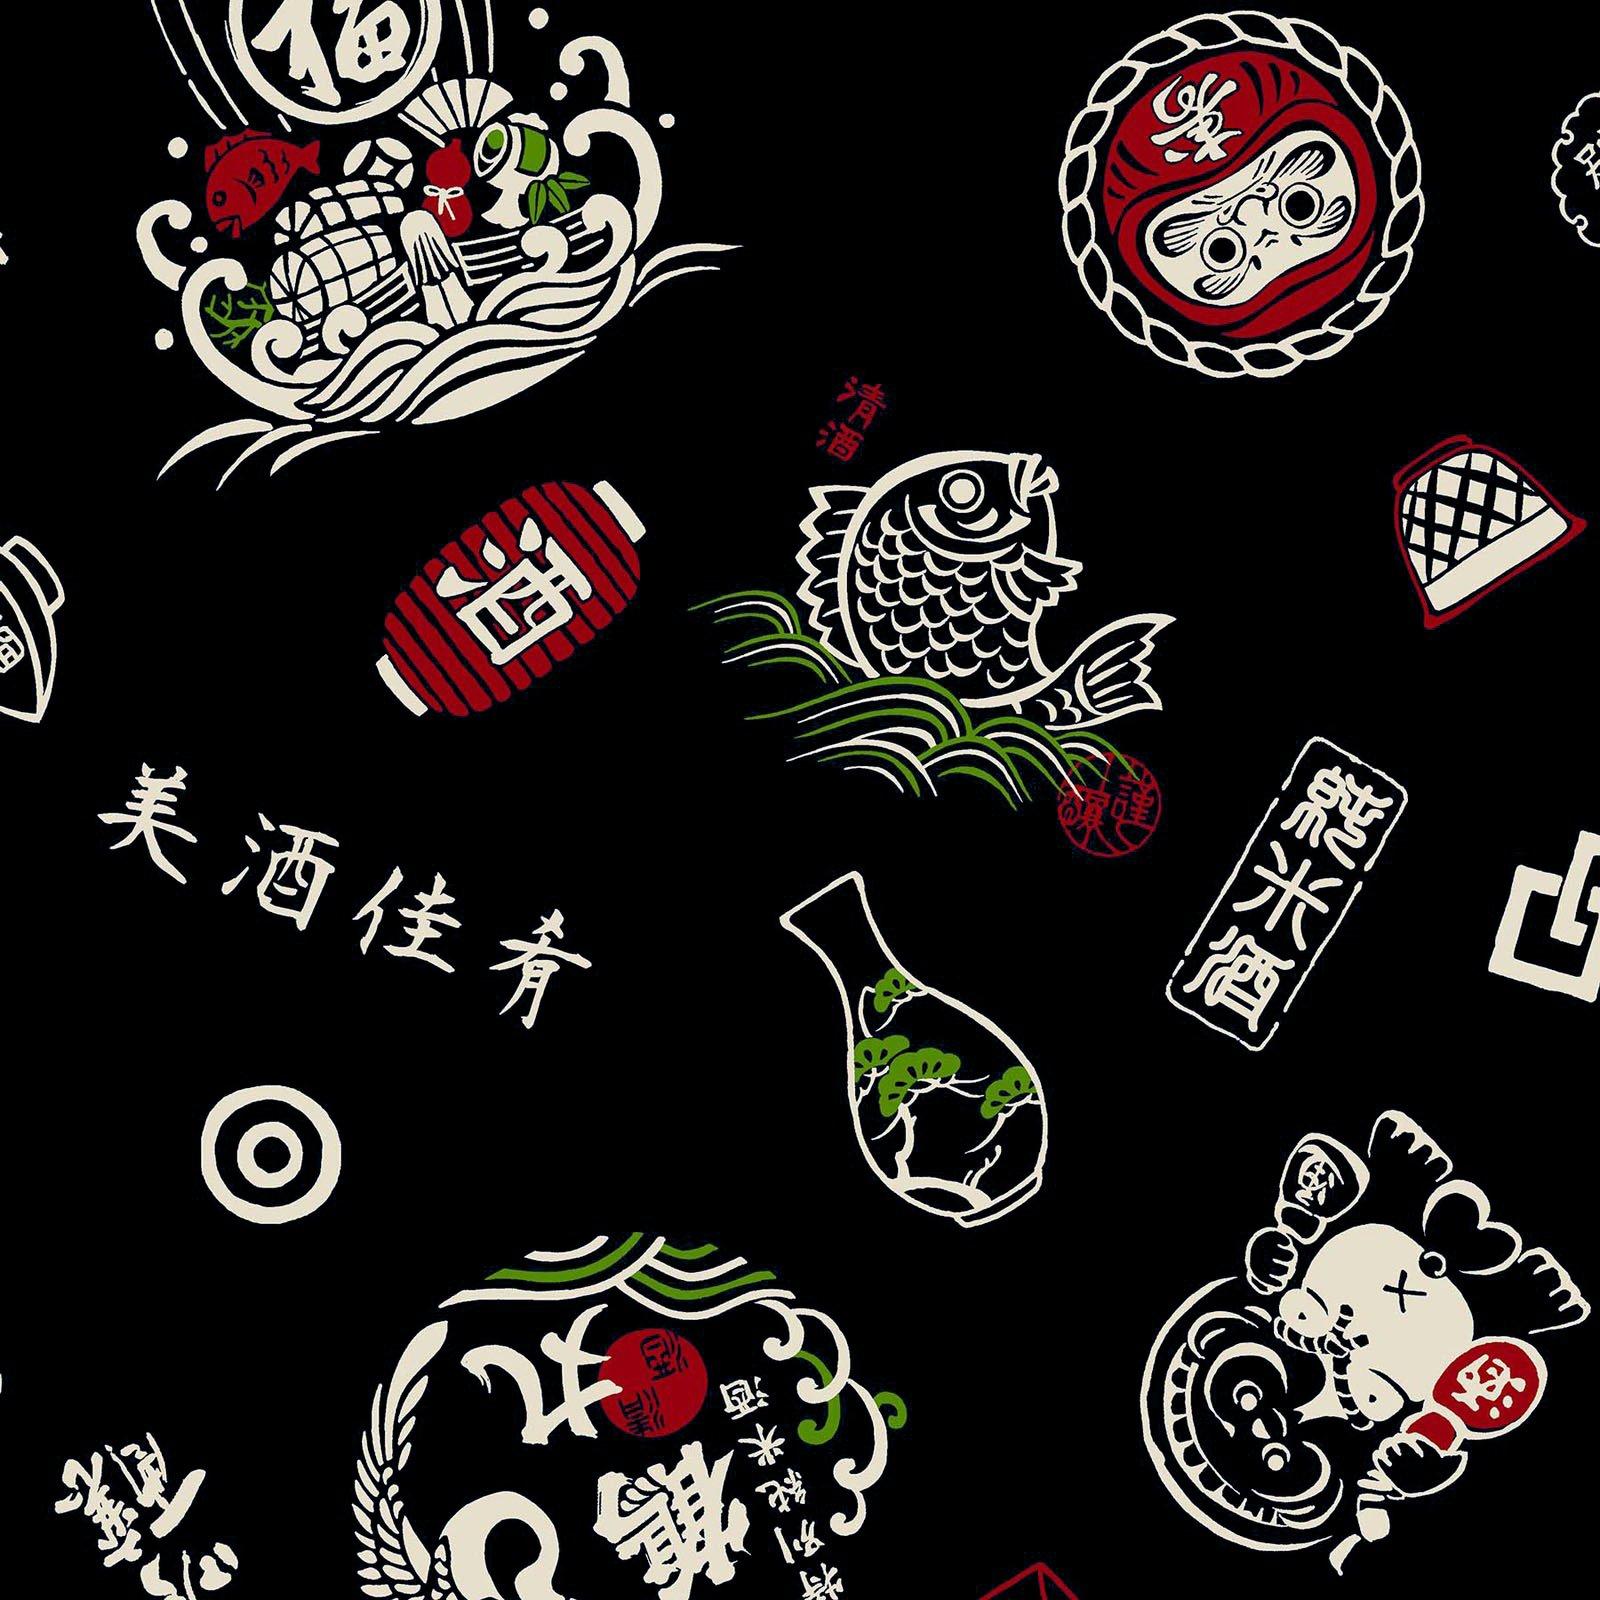 Retro Japanese Style - Sushi Bar Motifs - Black